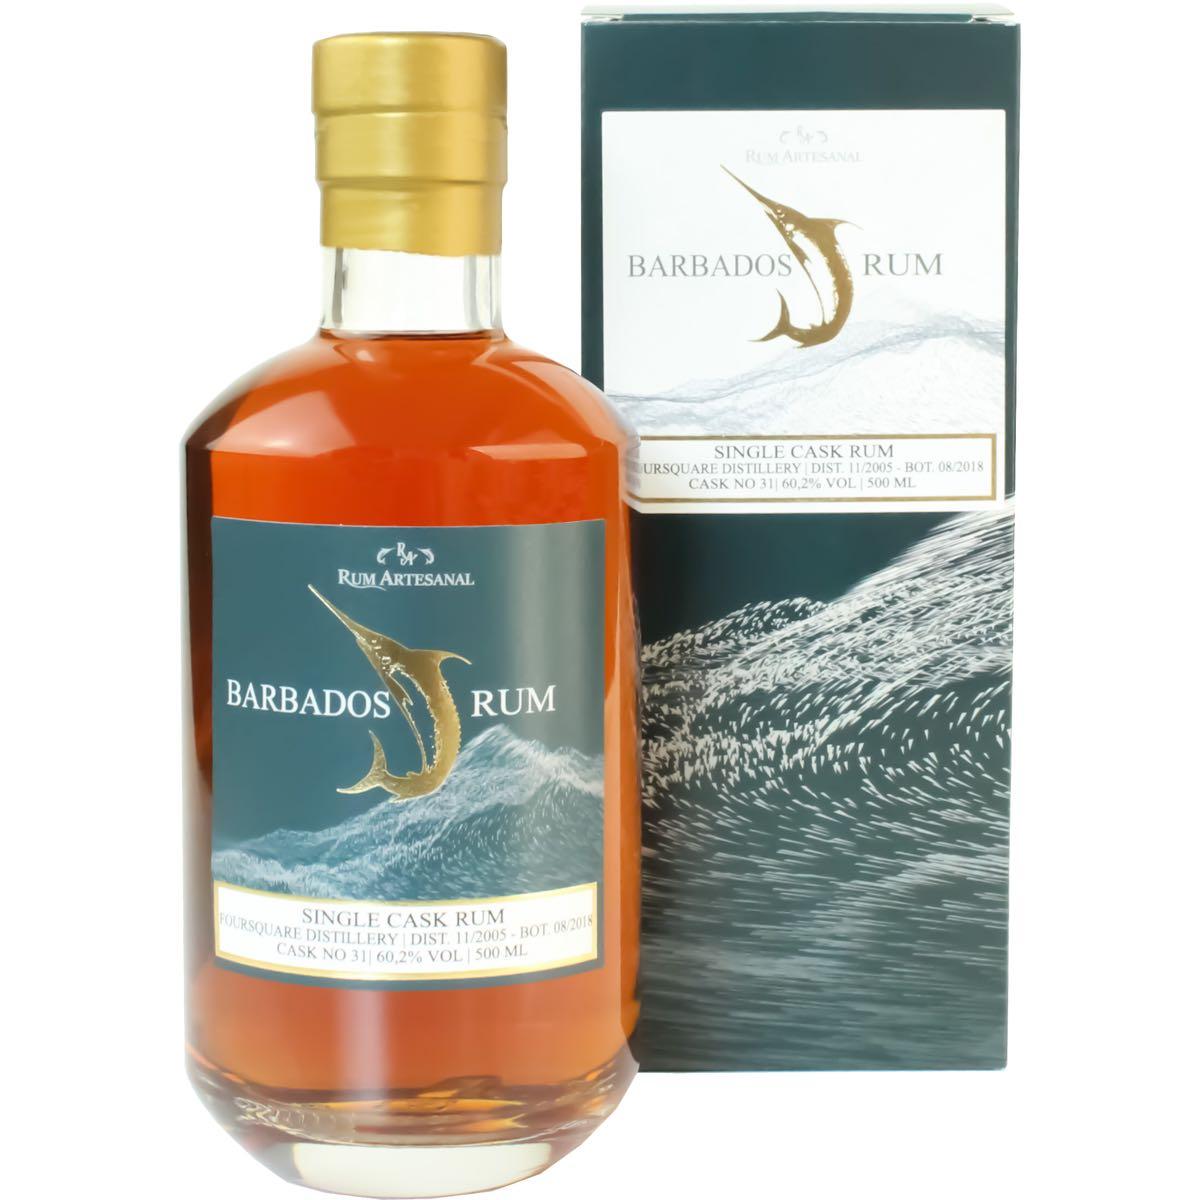 Bottle image of Rum Artesanal Barbados Rum